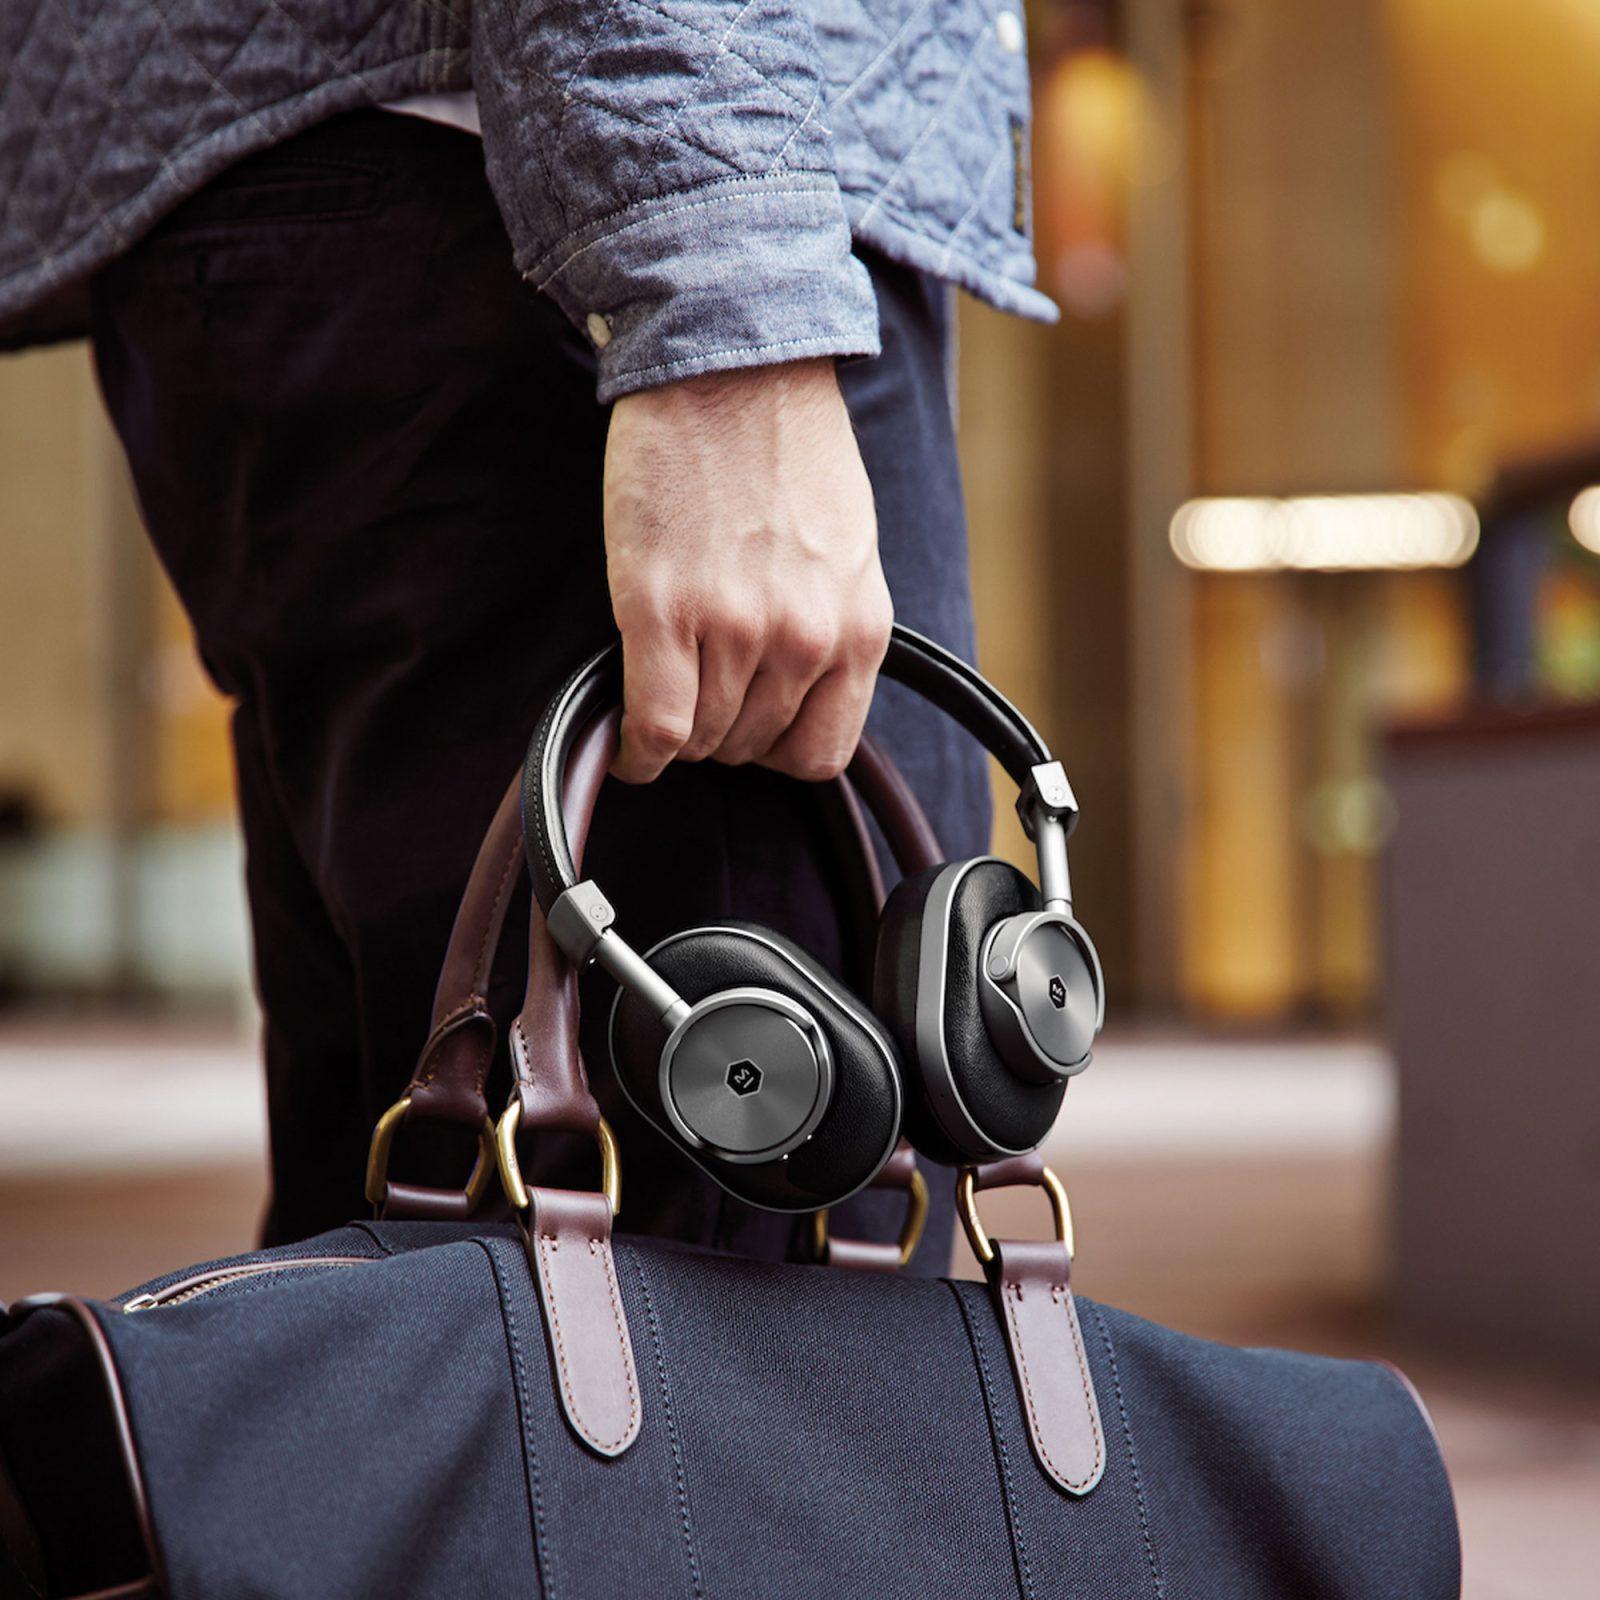 mw60-wireless-over-ear-headphones-gunmetal-4